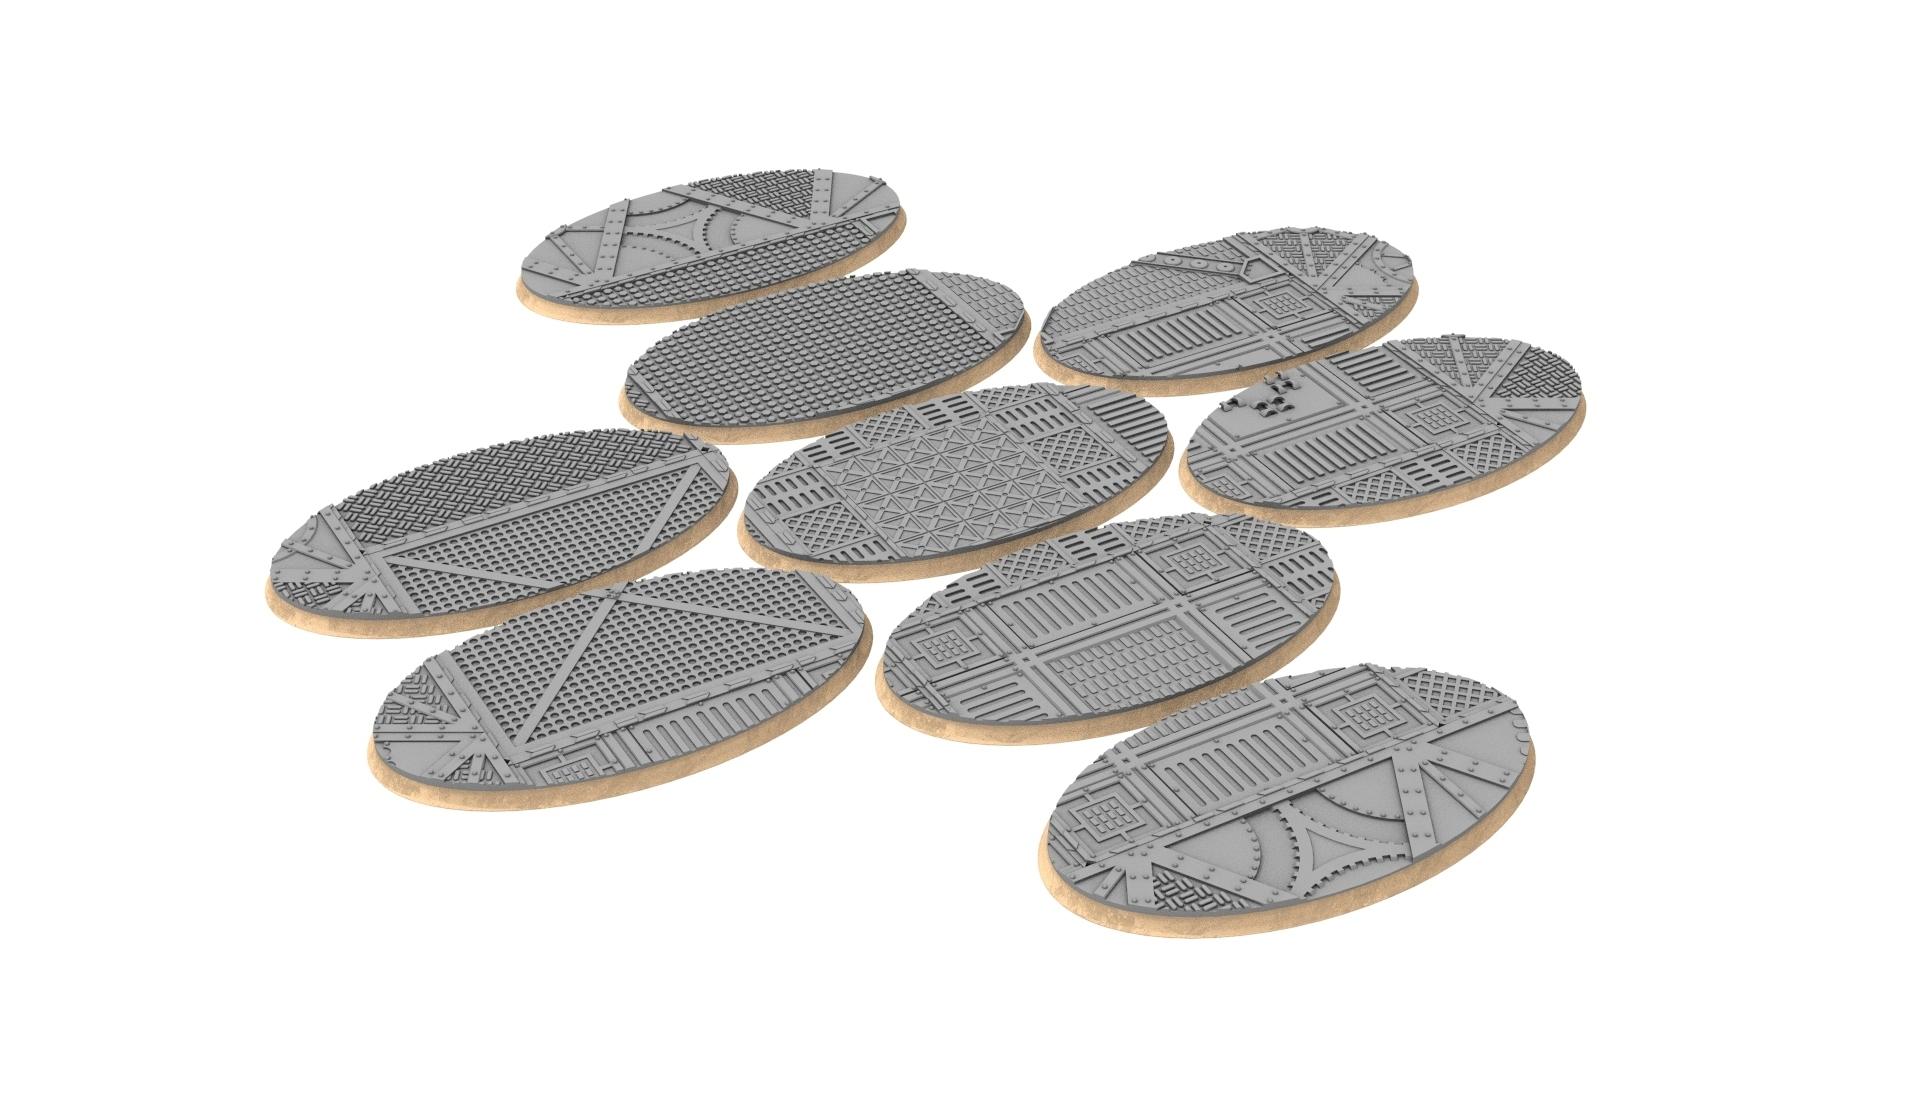 90x52.jpg Download STL file x1000 Round, oval, square, rectangular, hexagonal, industrial textured bases • 3D print design, Alario